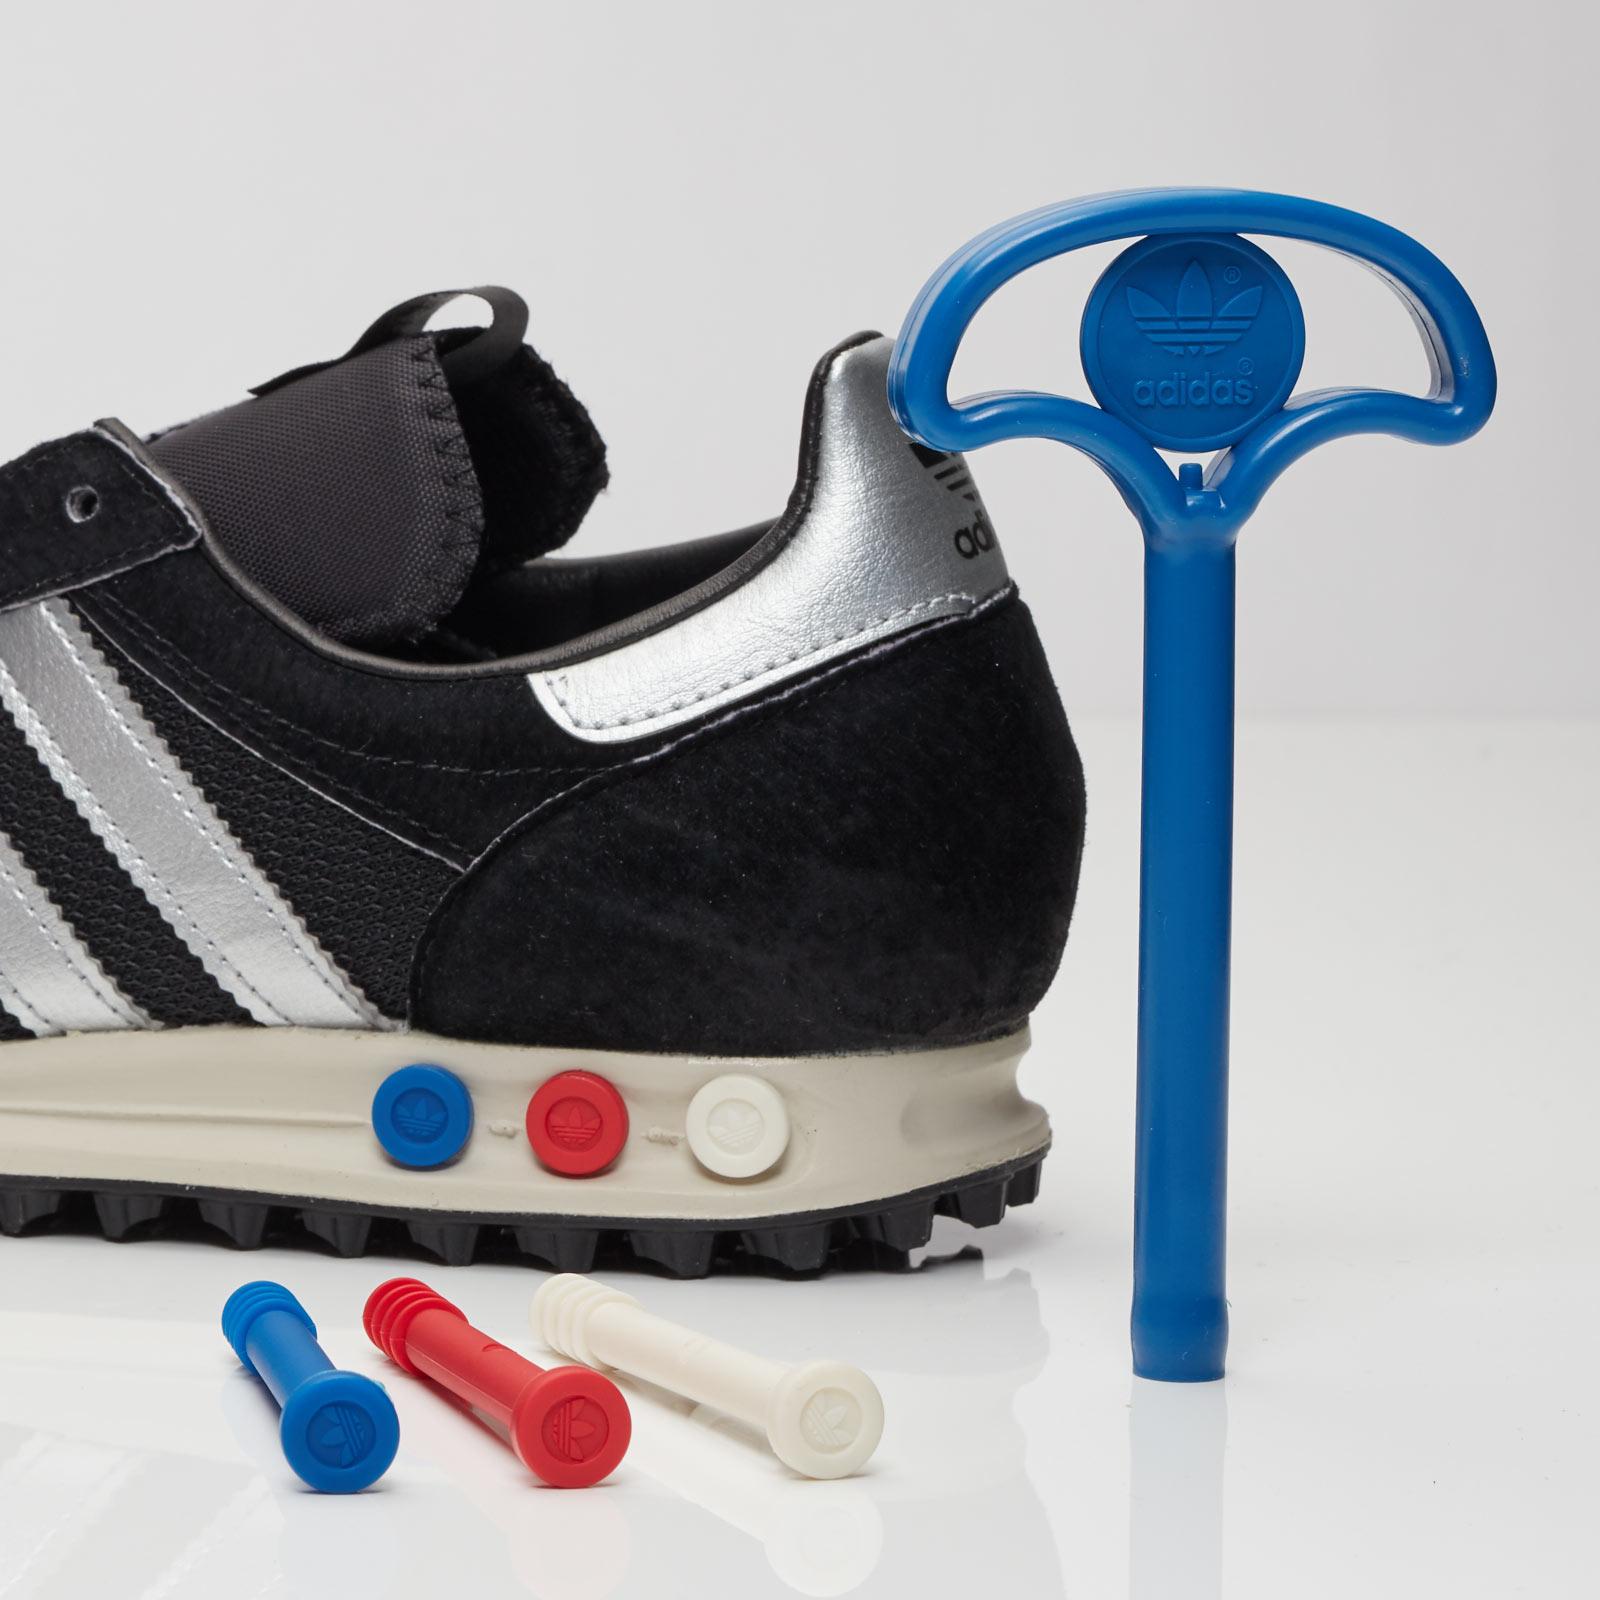 huge discount 36837 69573 adidas LA Trainer OG MIG - Bb3774 - Sneakersnstuff   sneakers   streetwear  online since 1999